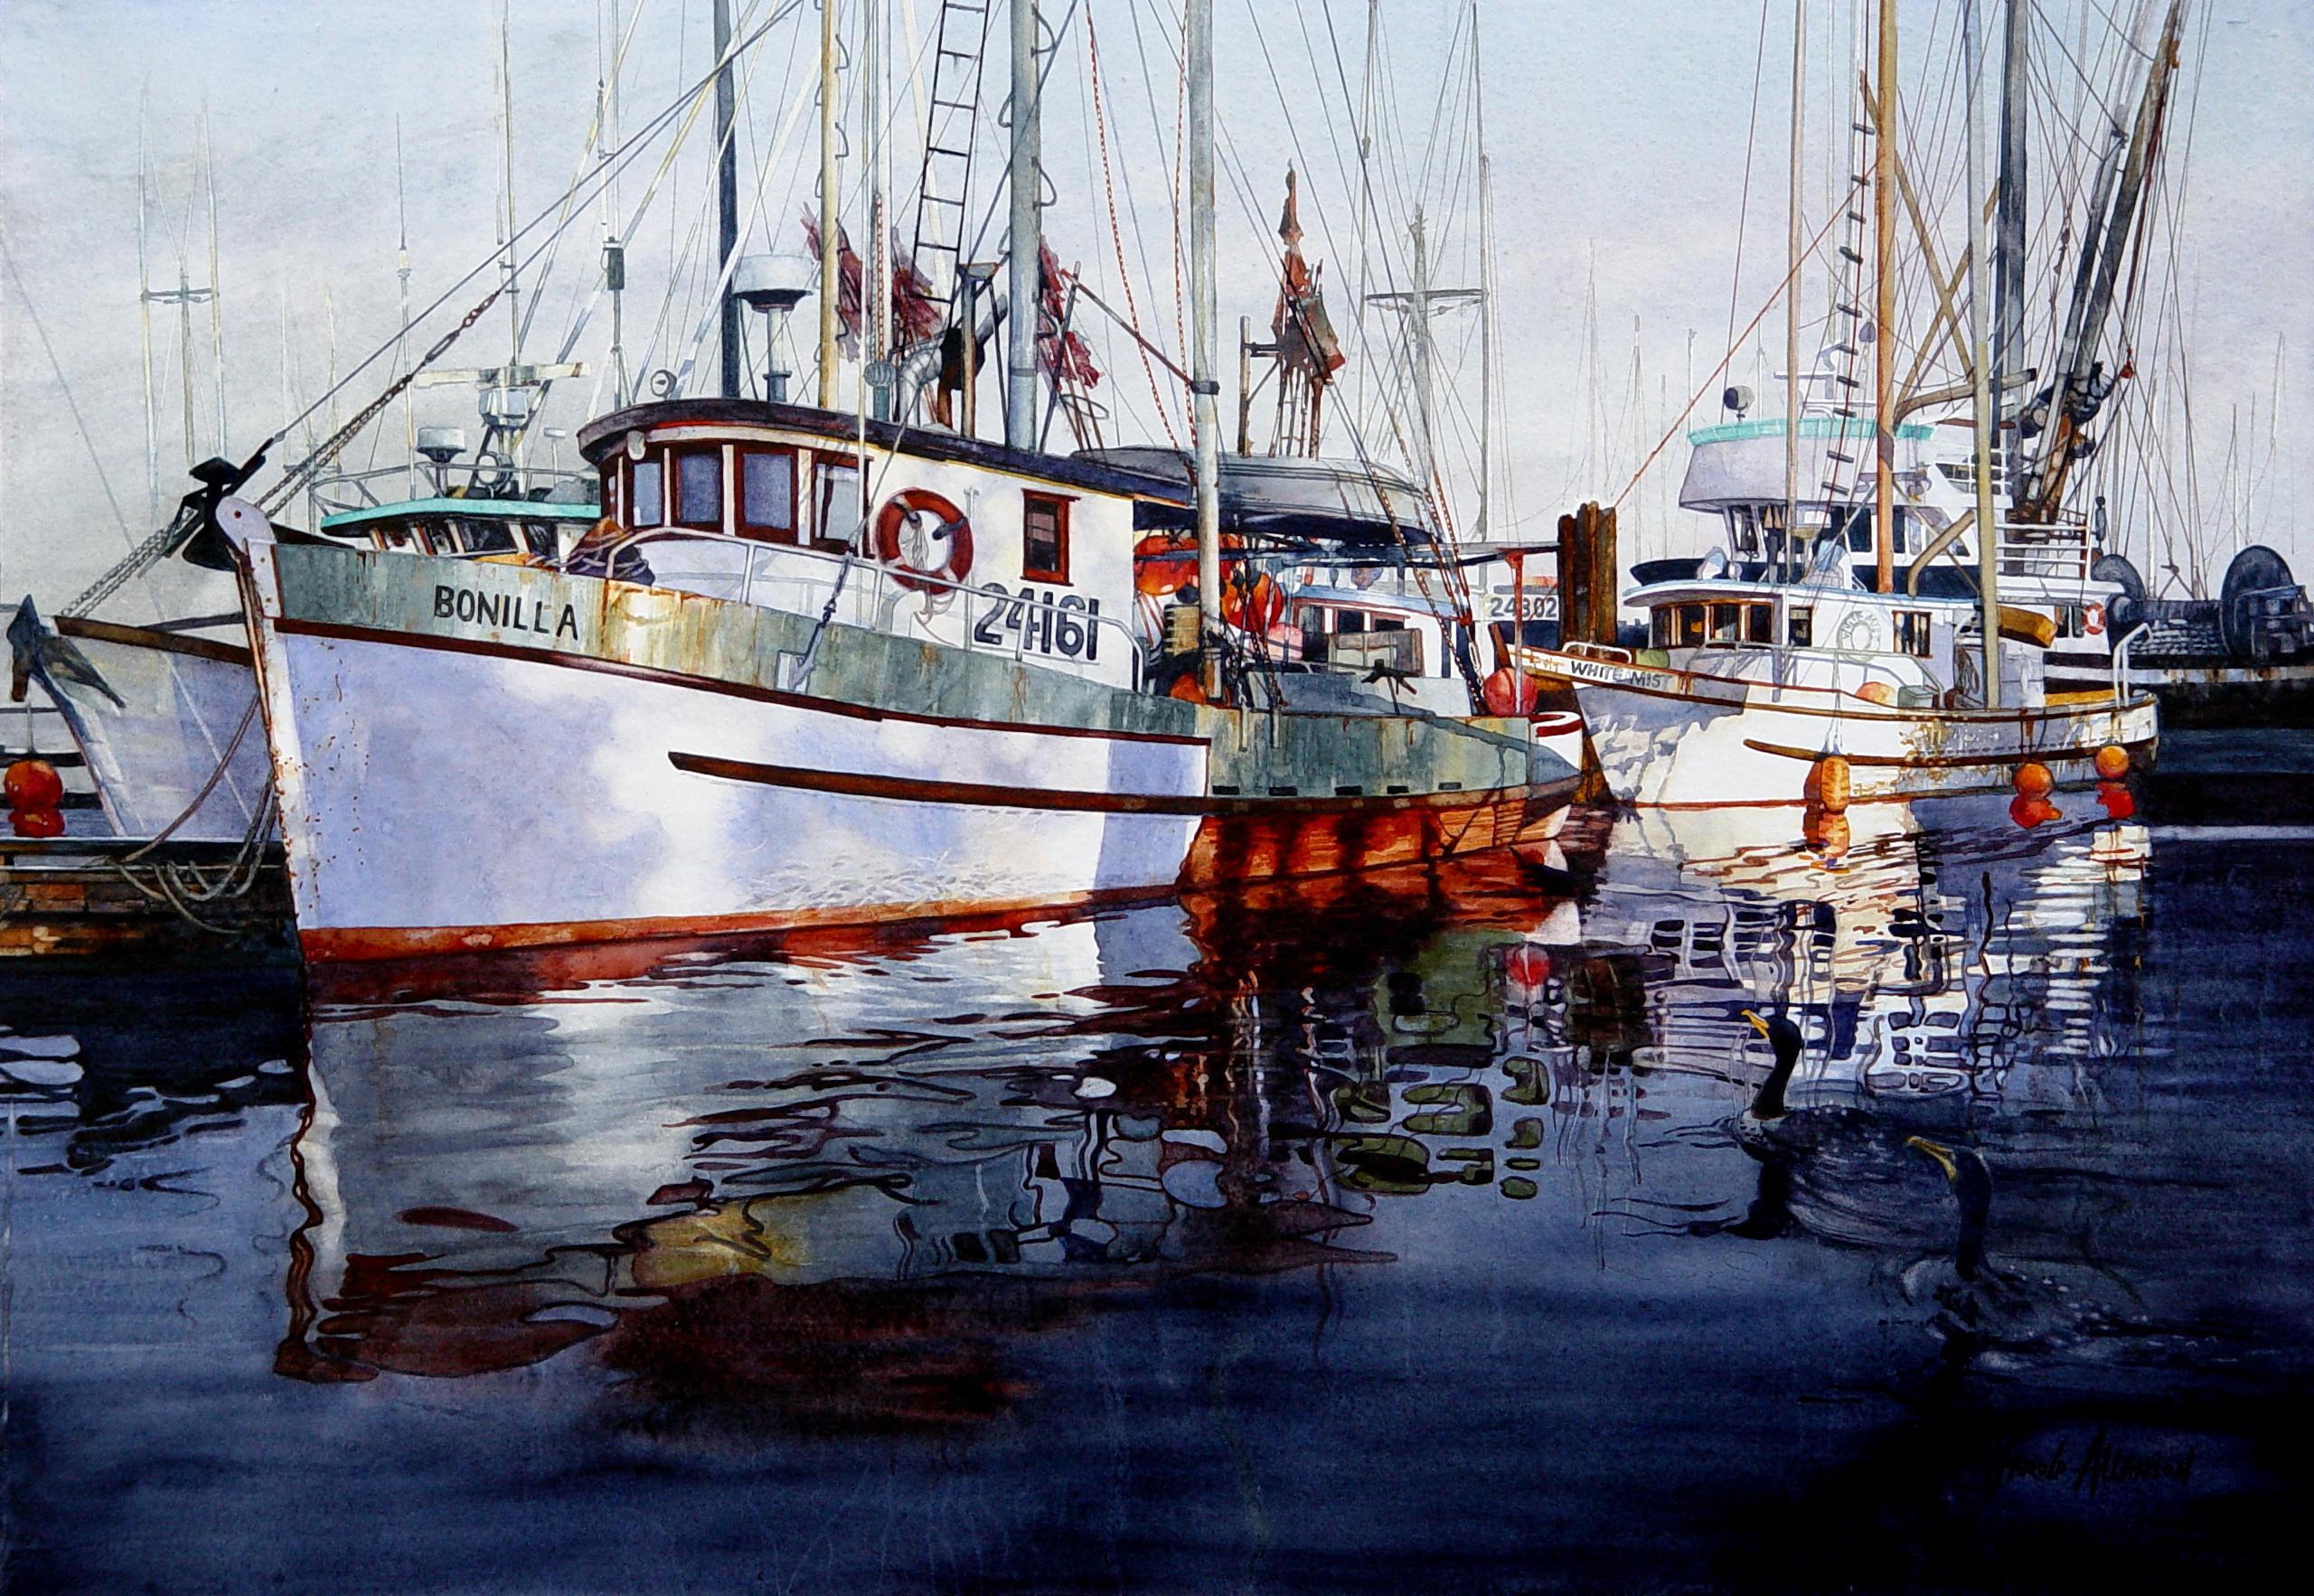 Bonilla by Harold Allanson